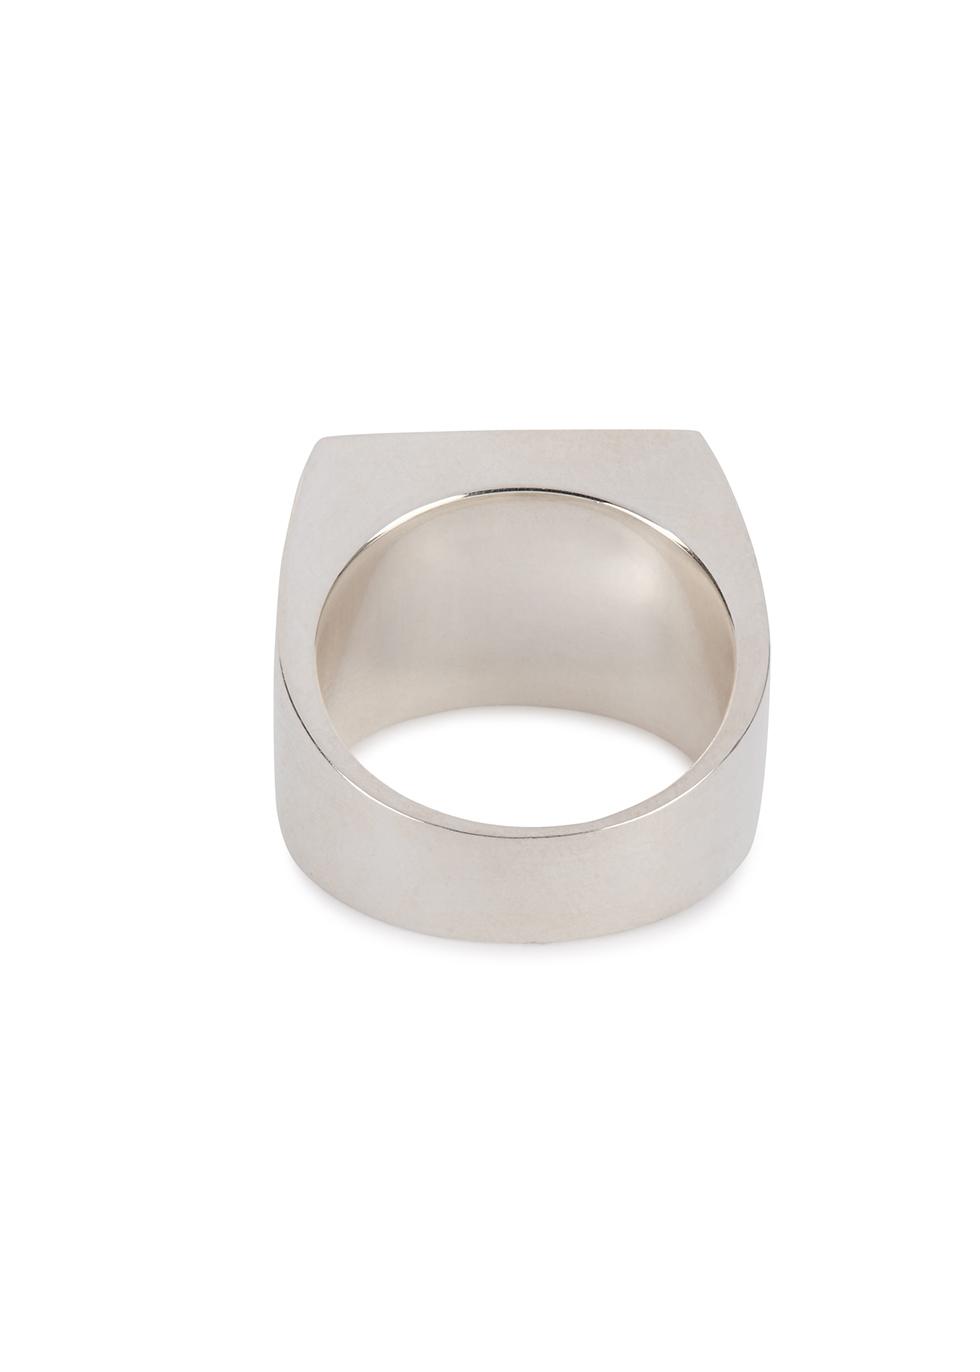 Sterling silver signet ring - LEGIER